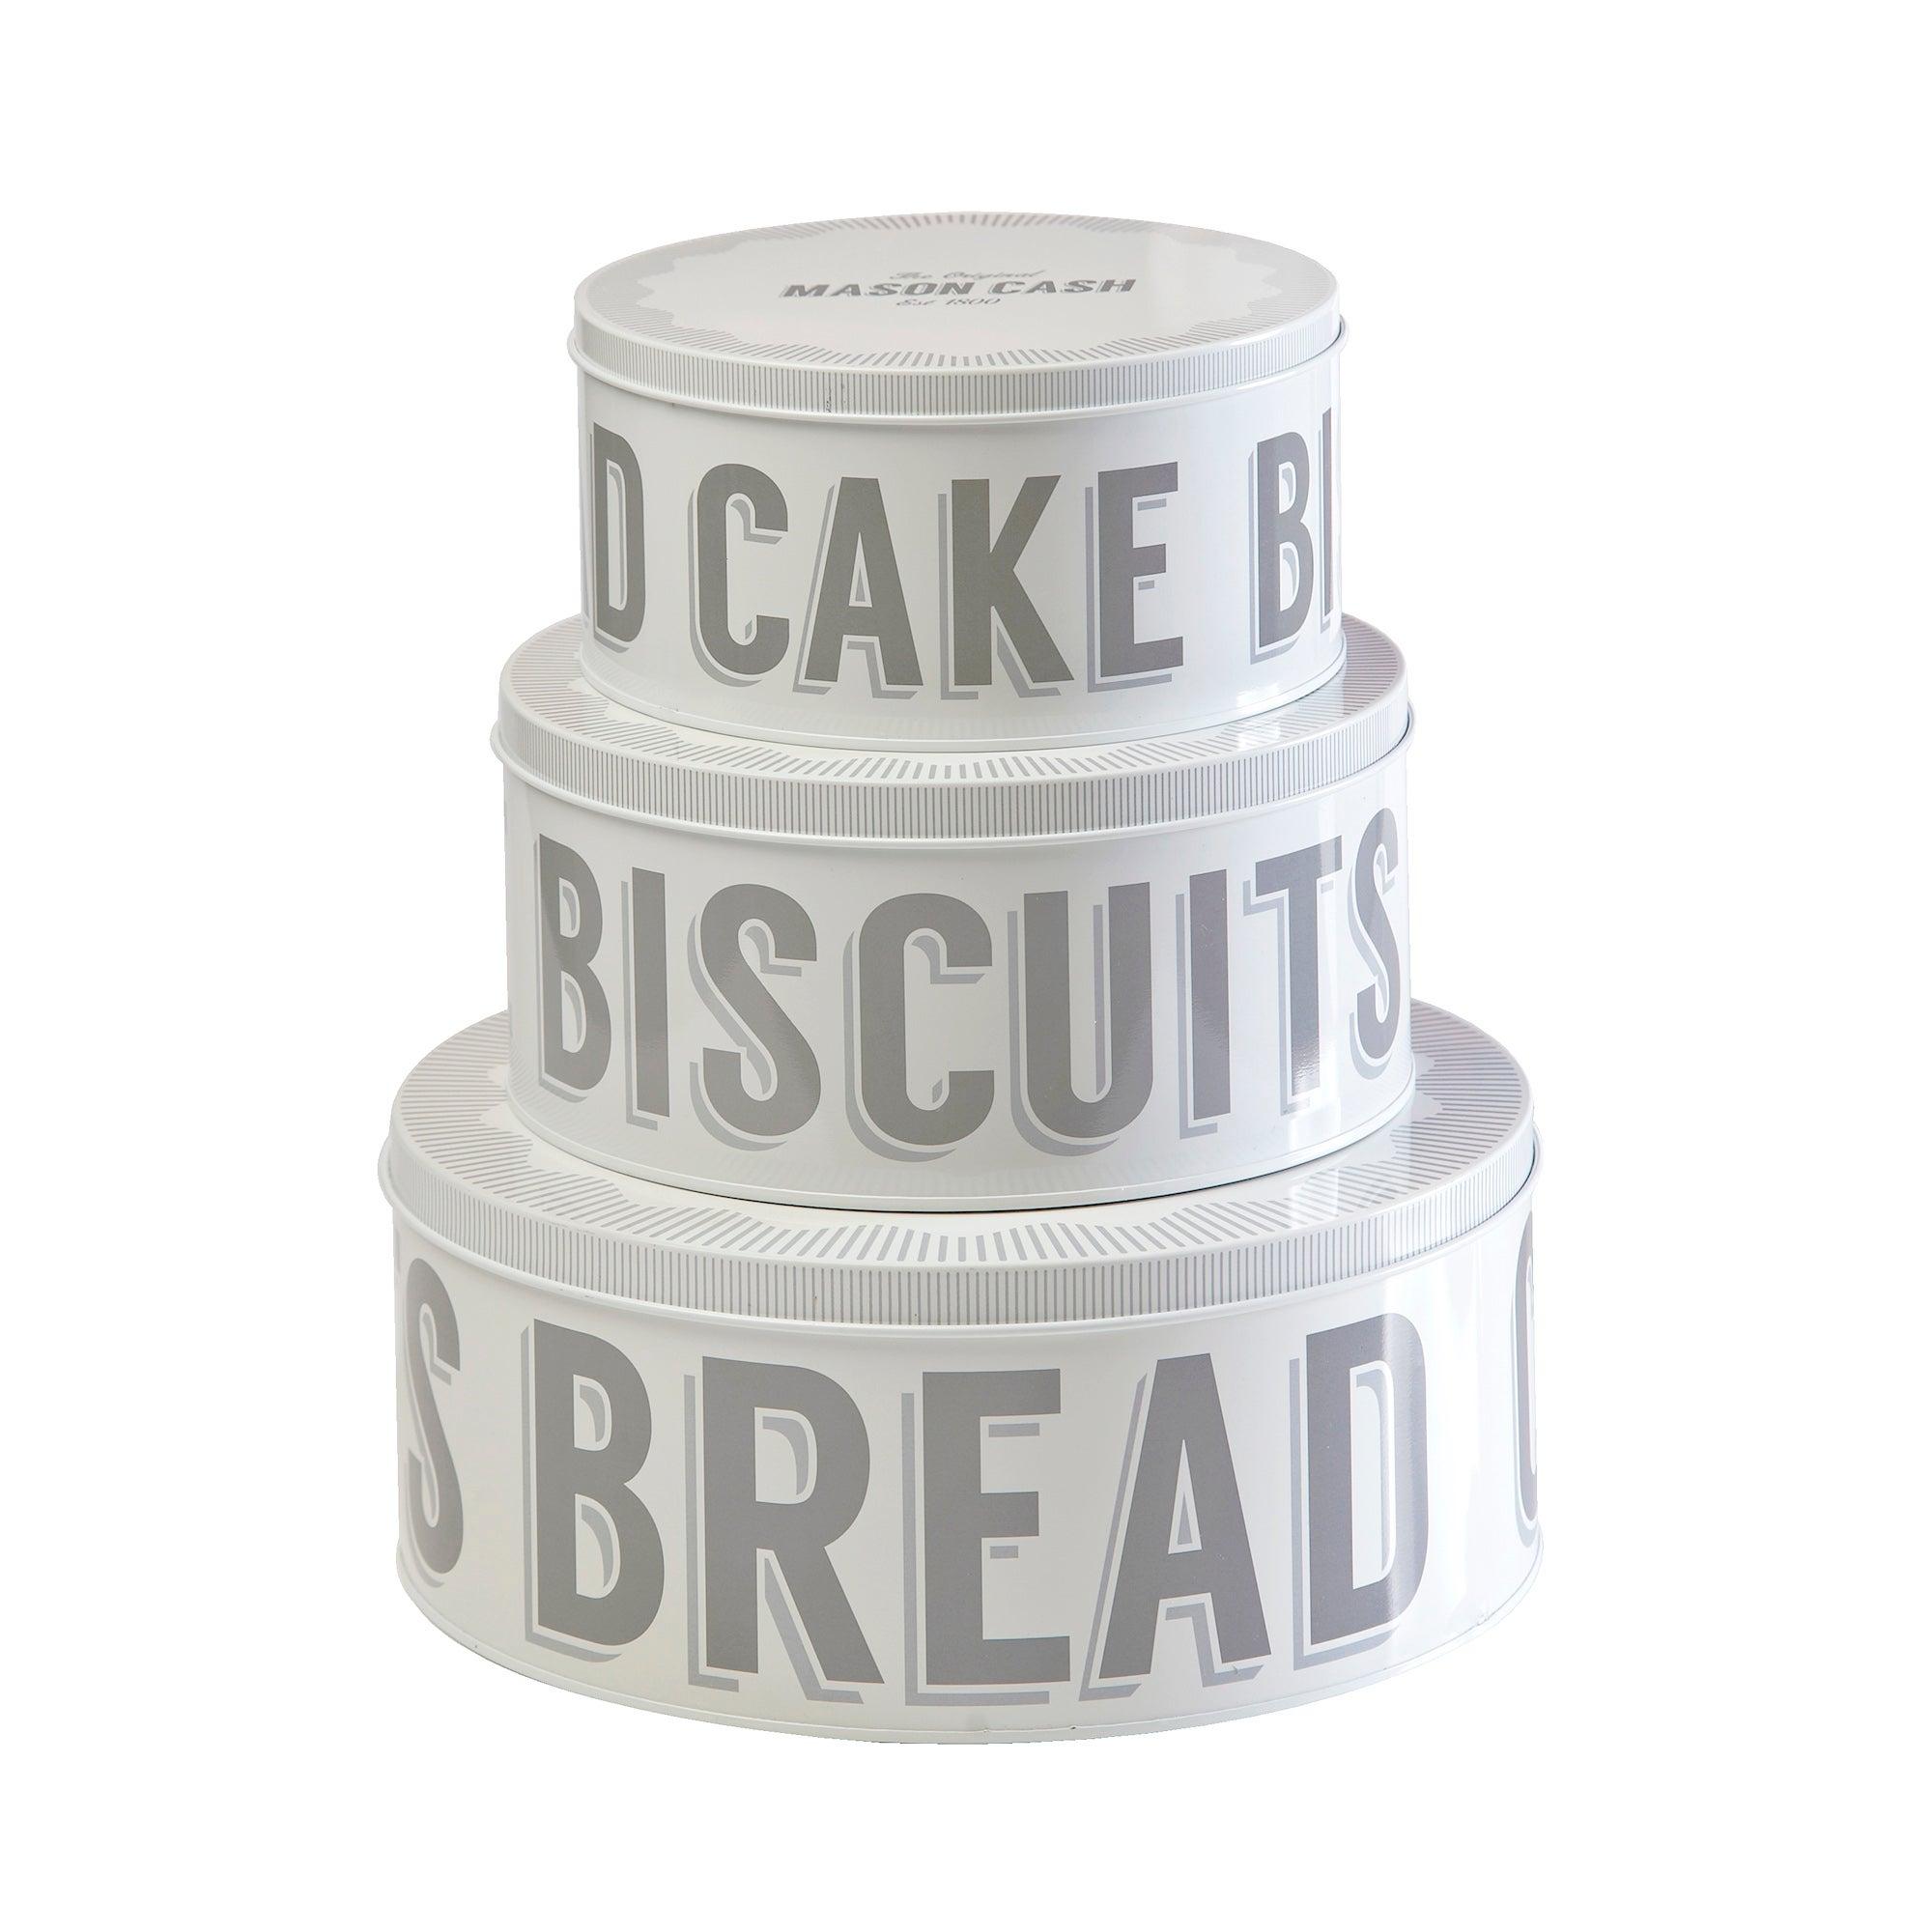 cheap cake storage tins best uk deals on kitchen to buy. Black Bedroom Furniture Sets. Home Design Ideas